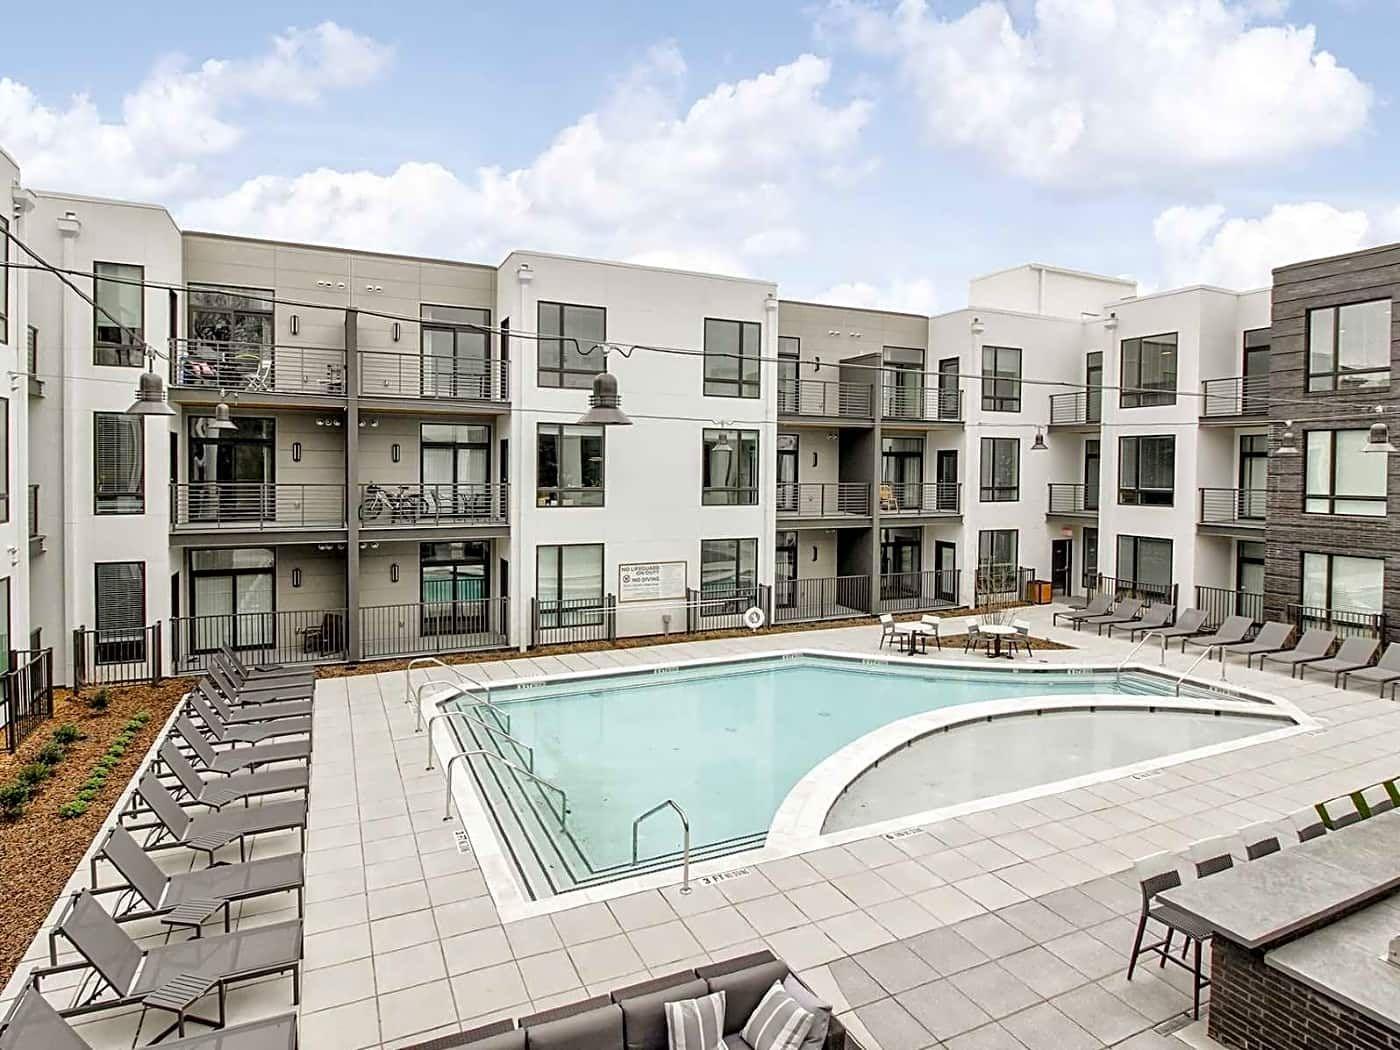 V21 21st Avenue South Nashville, TN Apartments for